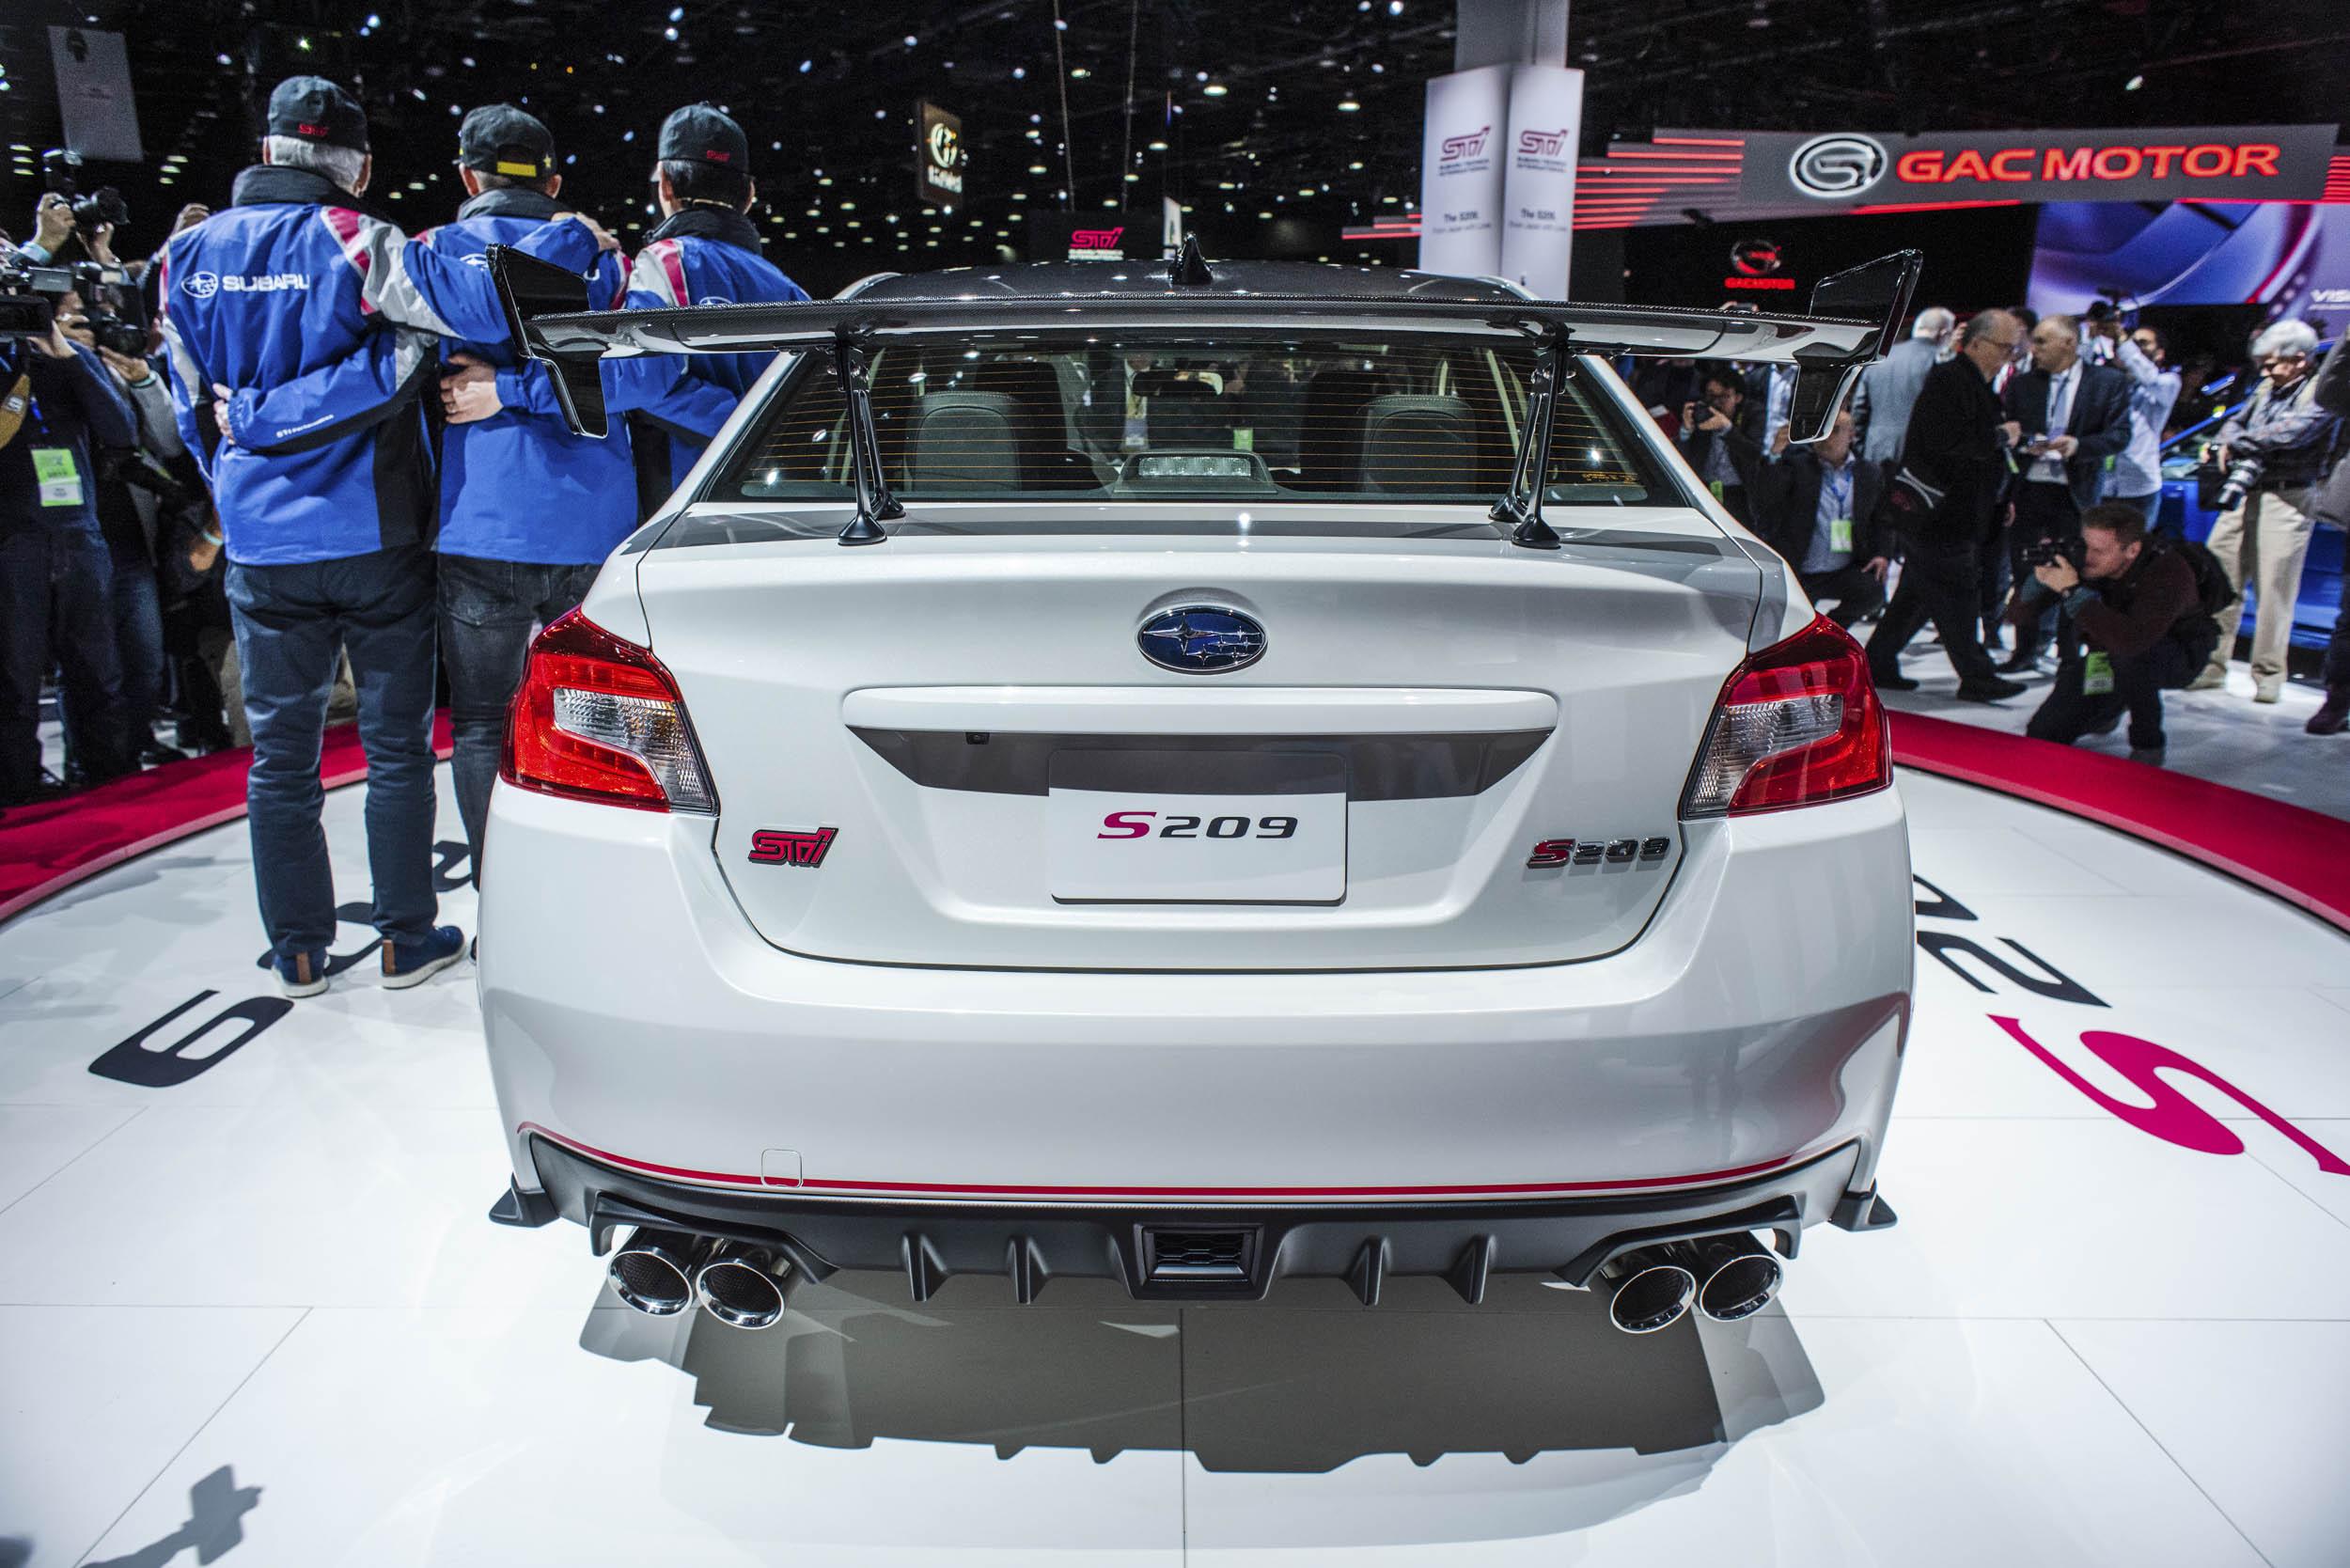 2020 Subaru WRX STI S209 back